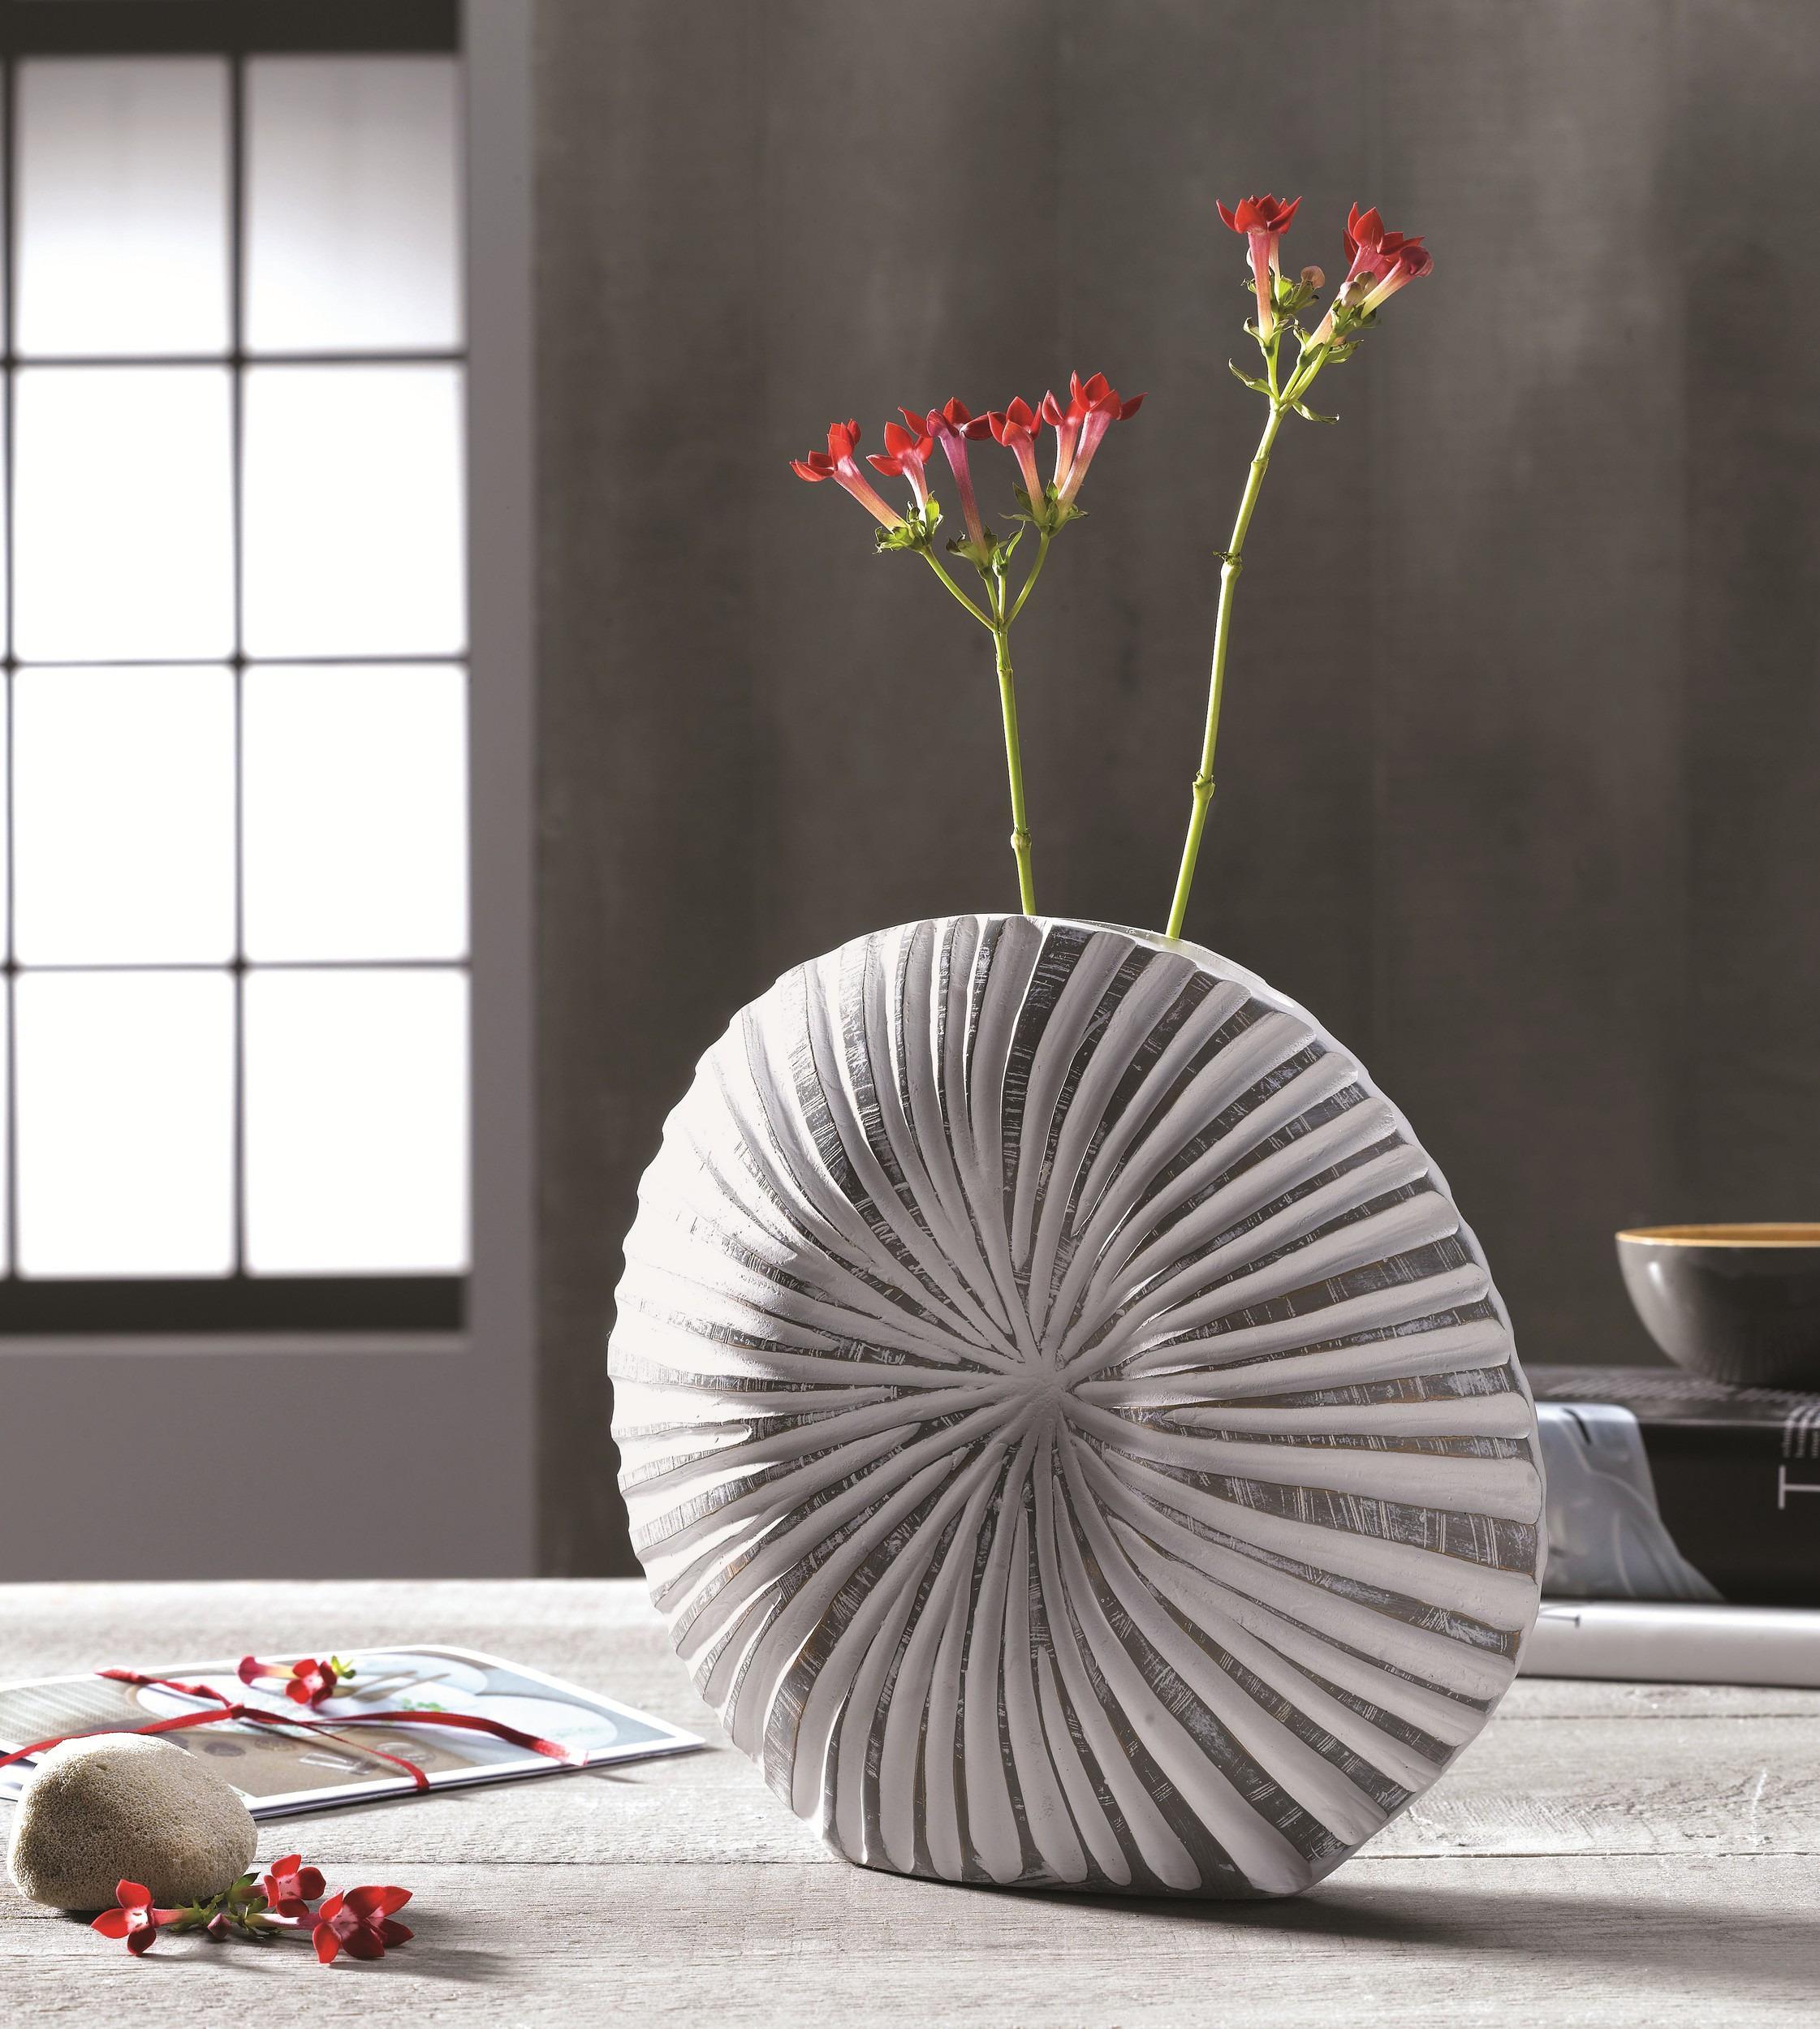 Plochá dekoračná váza 35 cm, pruhy, polyresinová